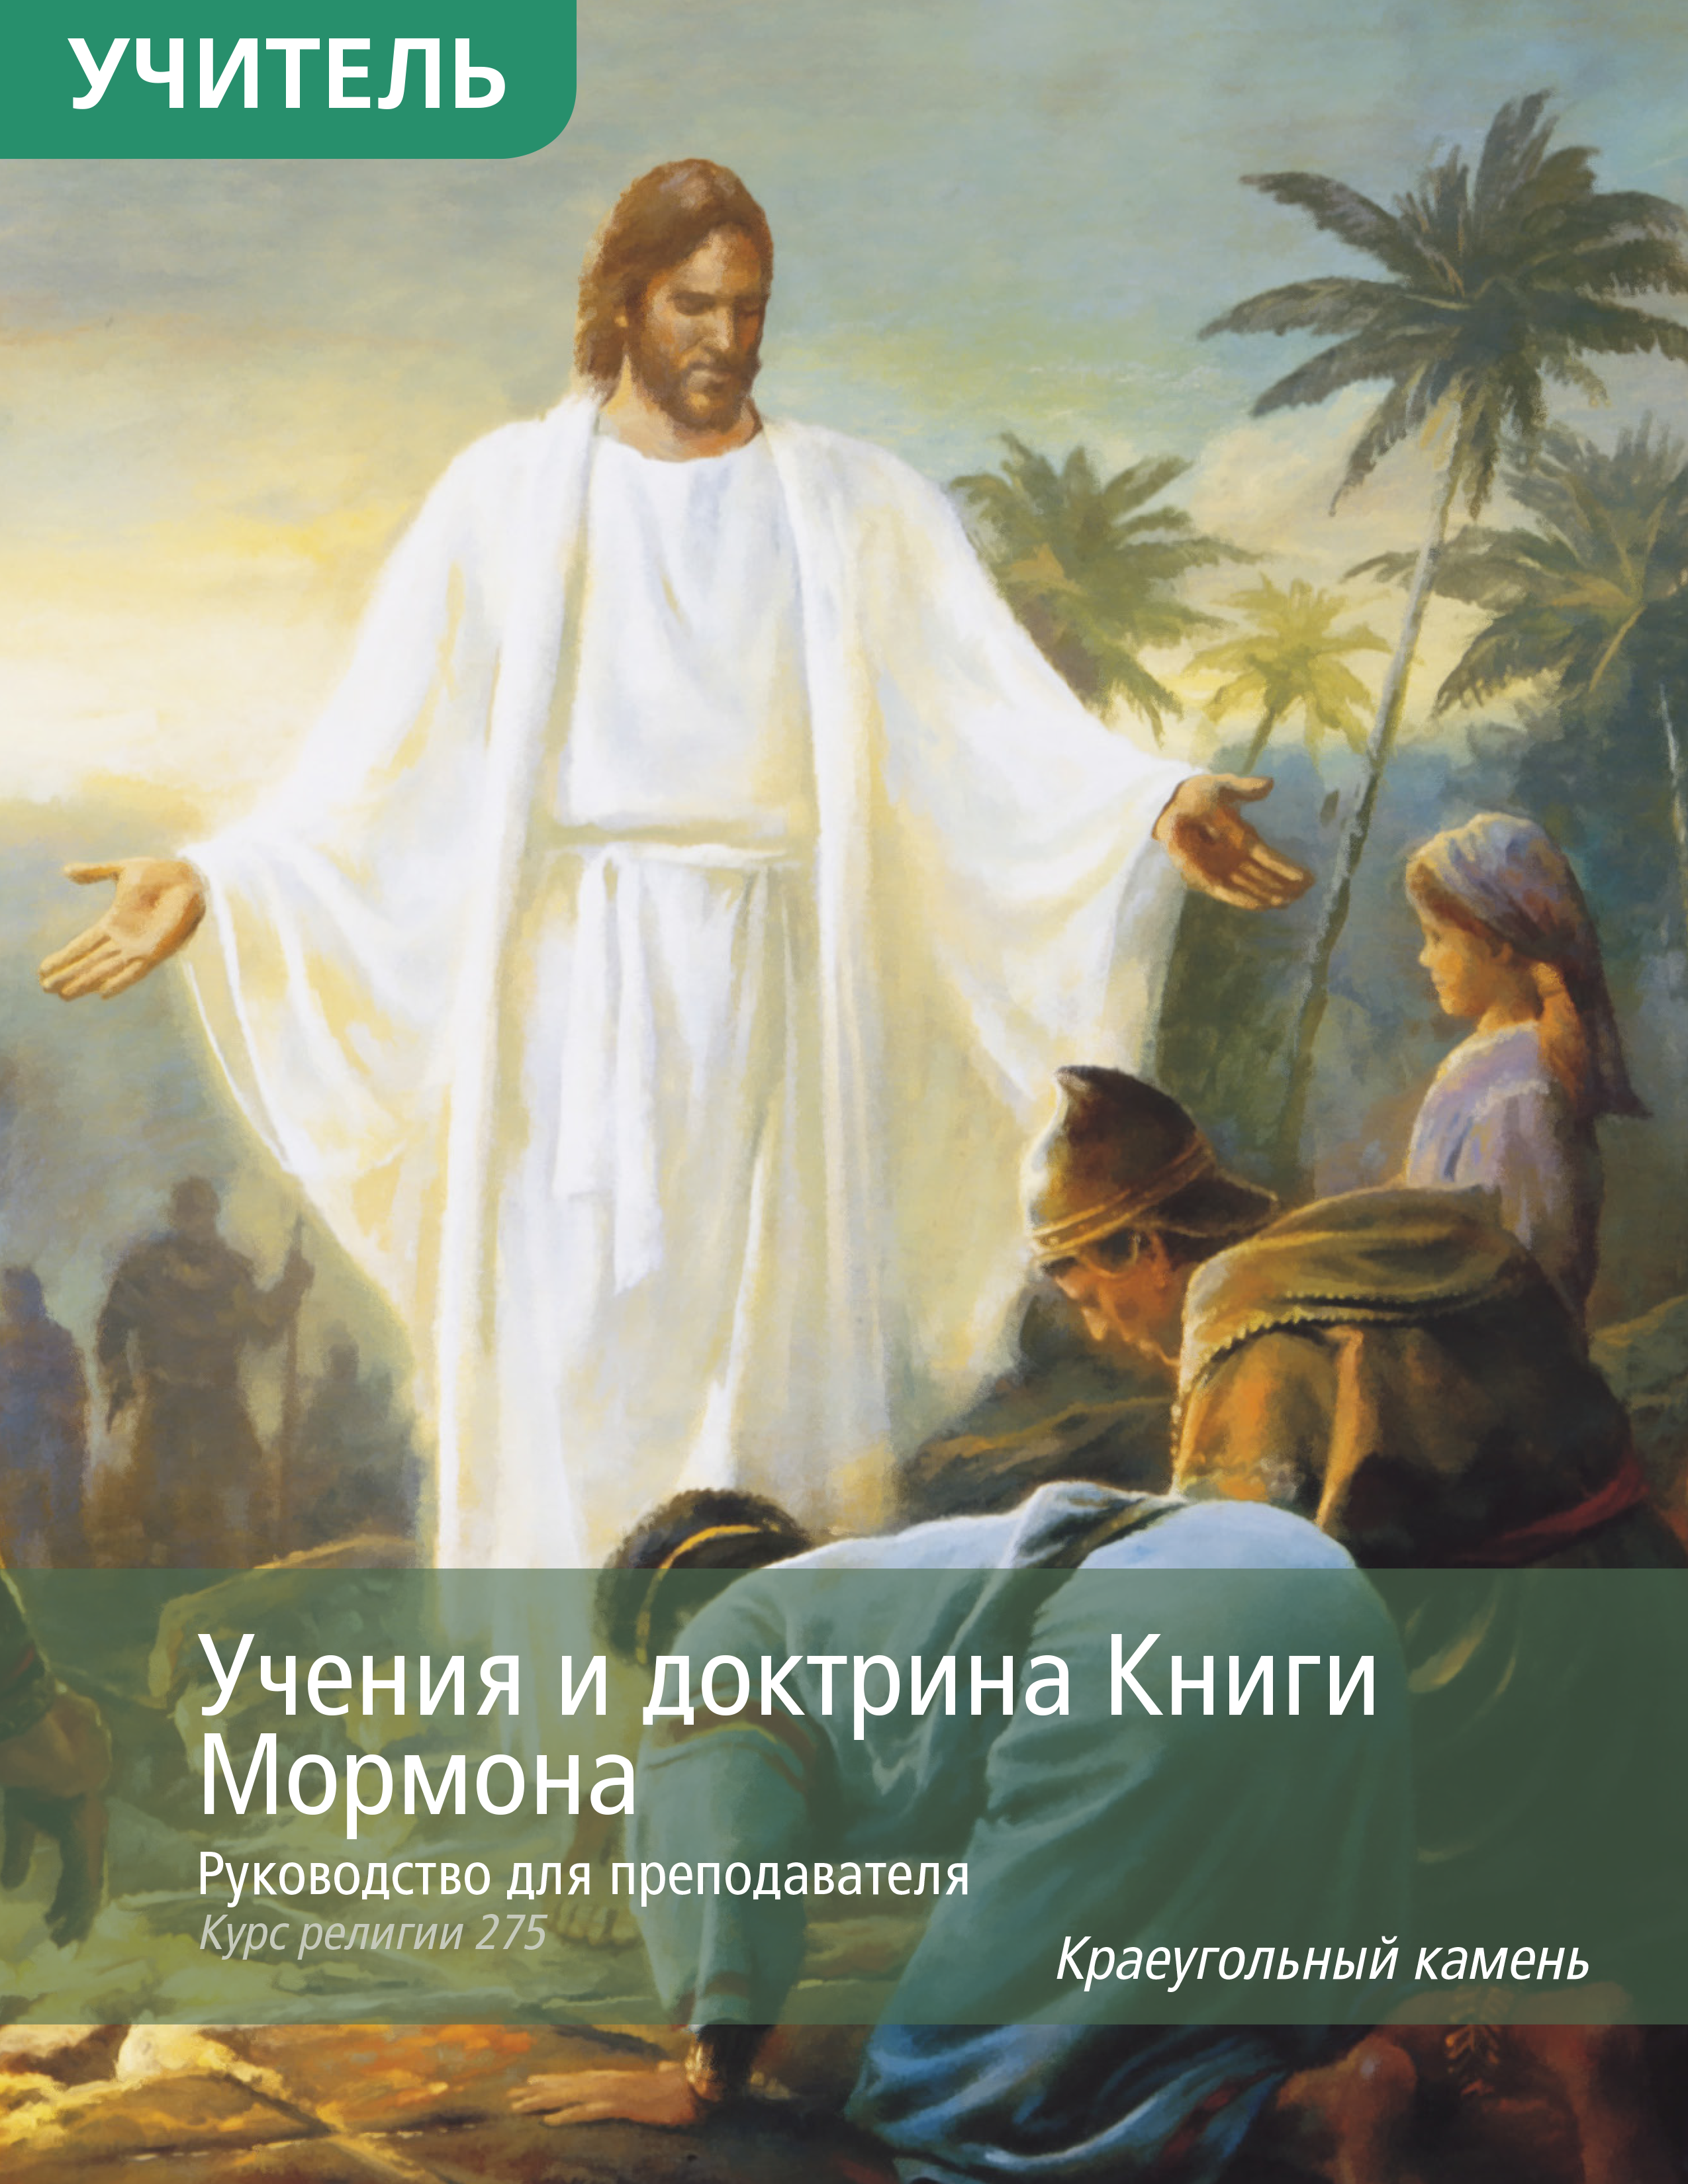 Учения и доктрина Книги Мормона. Руководство для преподавателя (КР 275)